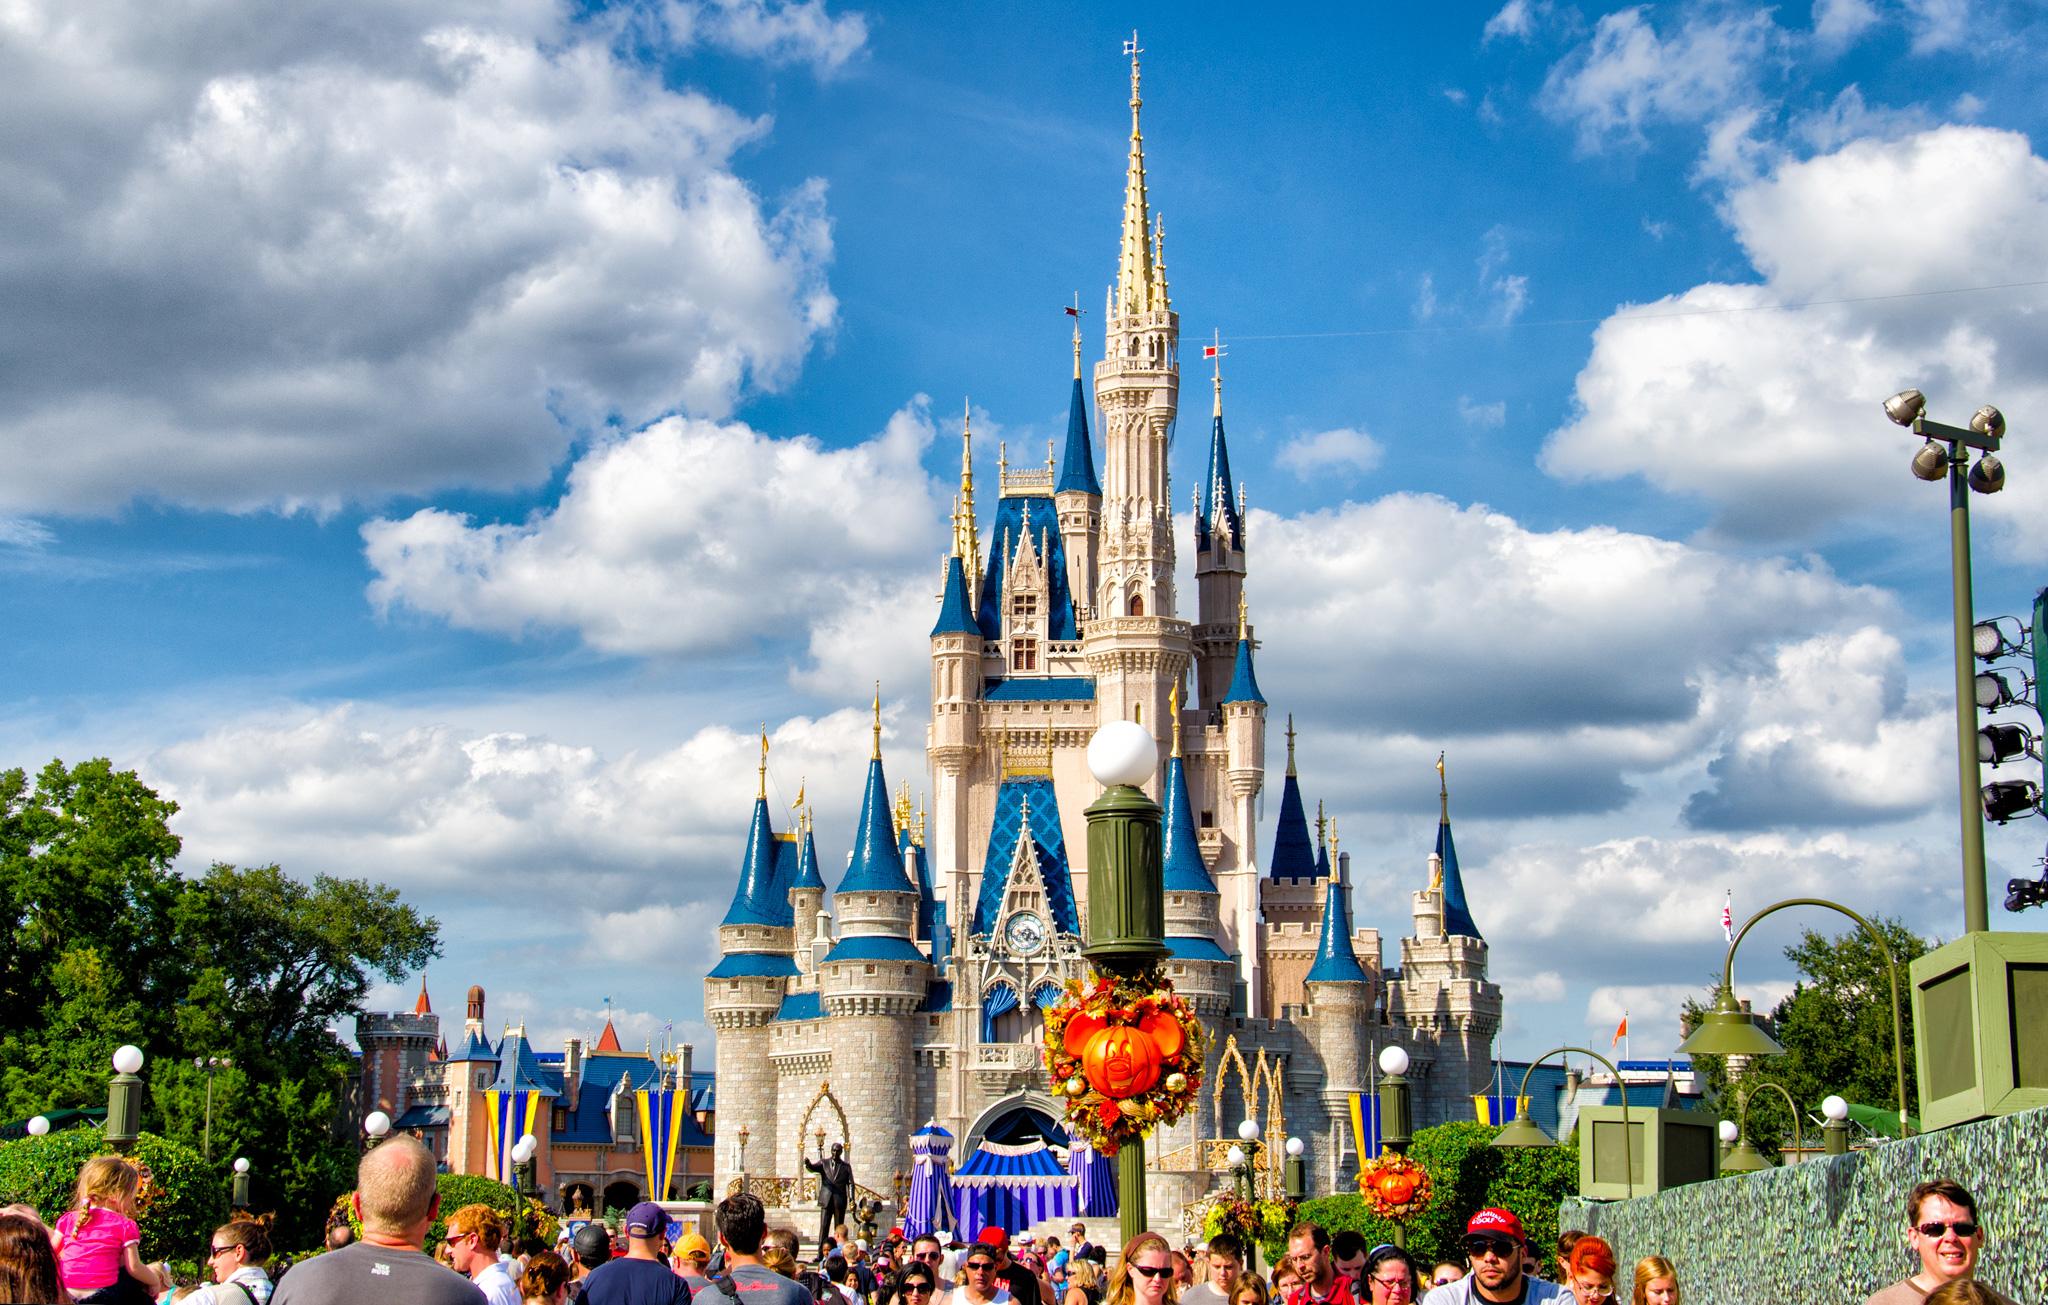 Welcome To Wdwnewscom! Home Of Everything Walt Disney - HD1600×1019